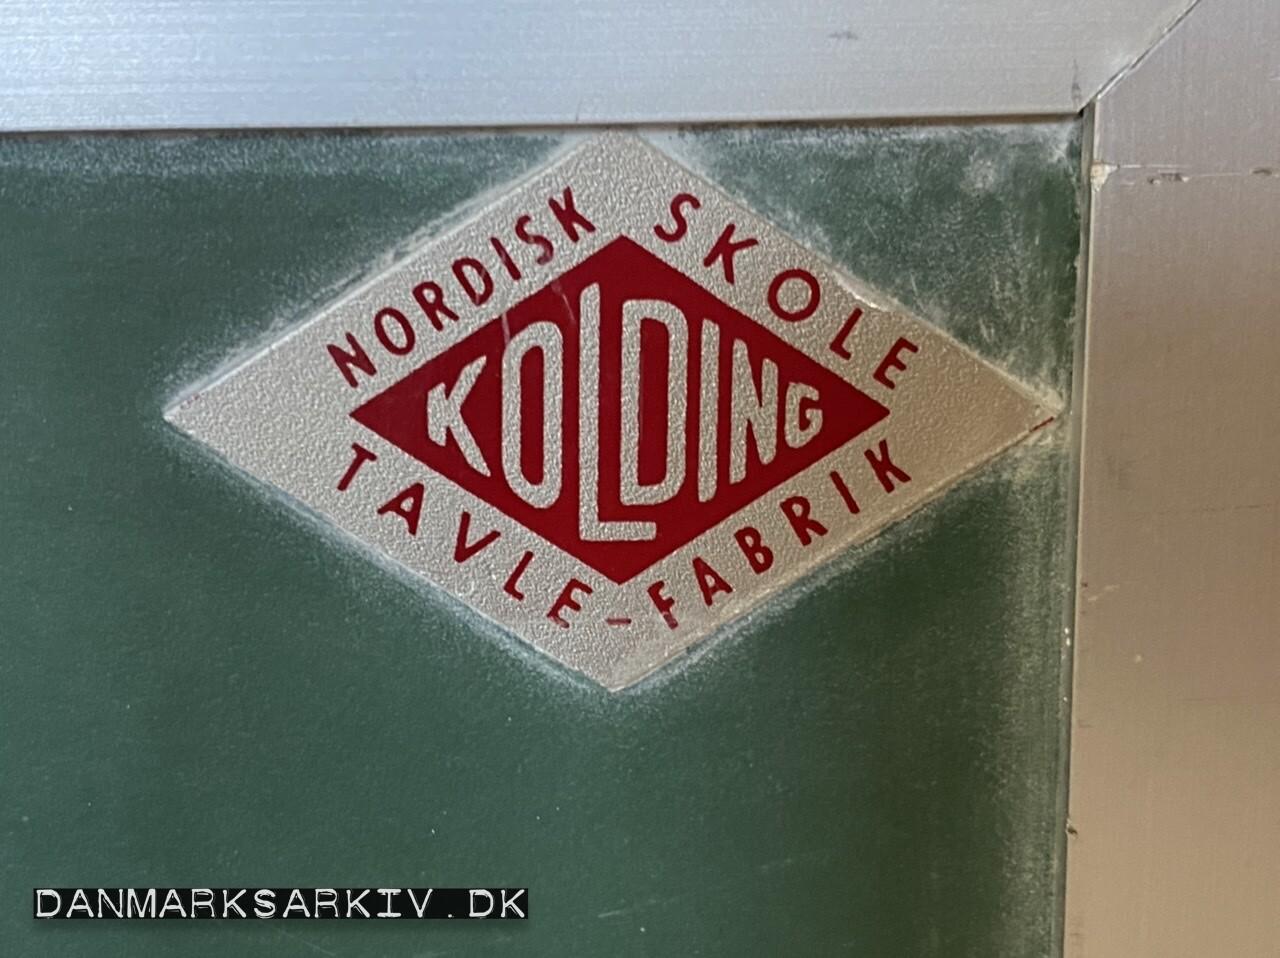 Nordisk Skoletavle Fabrik - Kolding